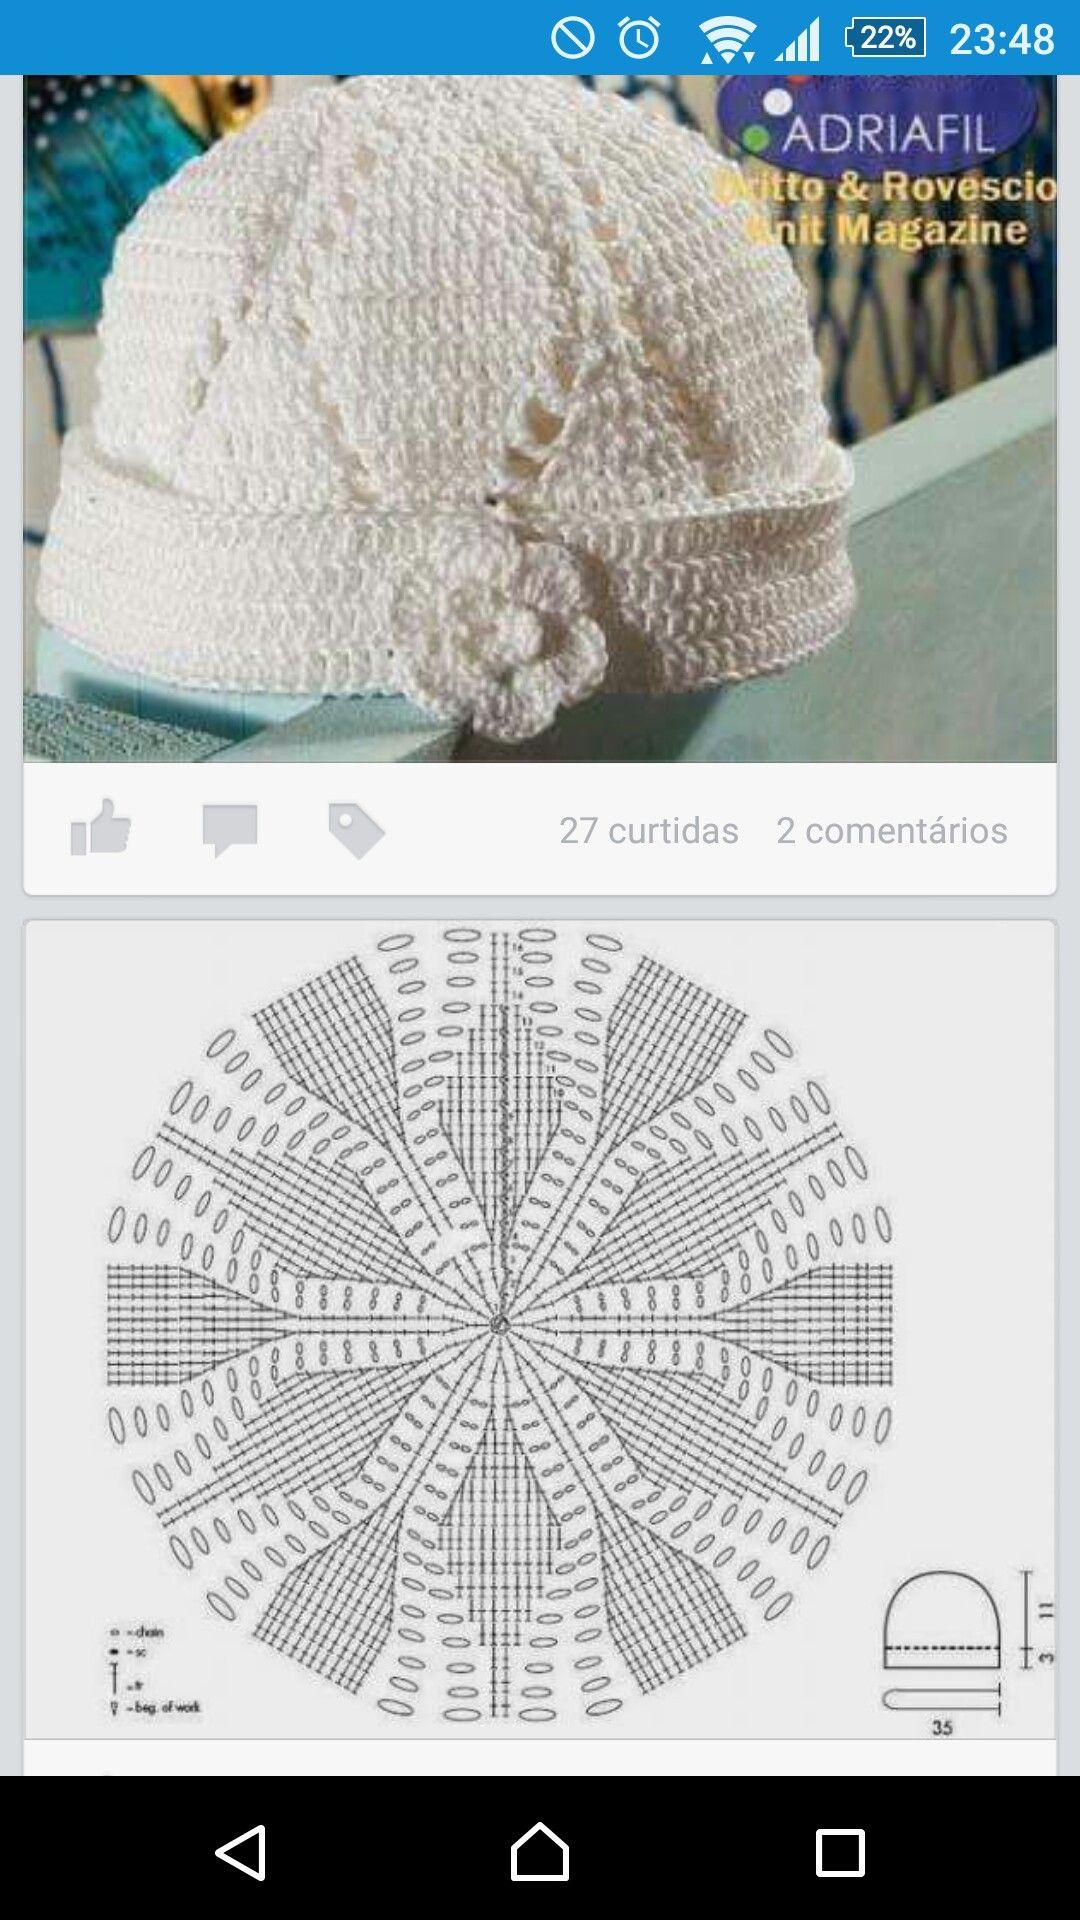 Pin de เด็กหญิงบุญถึง ก้อไม่รู้สินะ en แพทเทิร์น | Pinterest ...